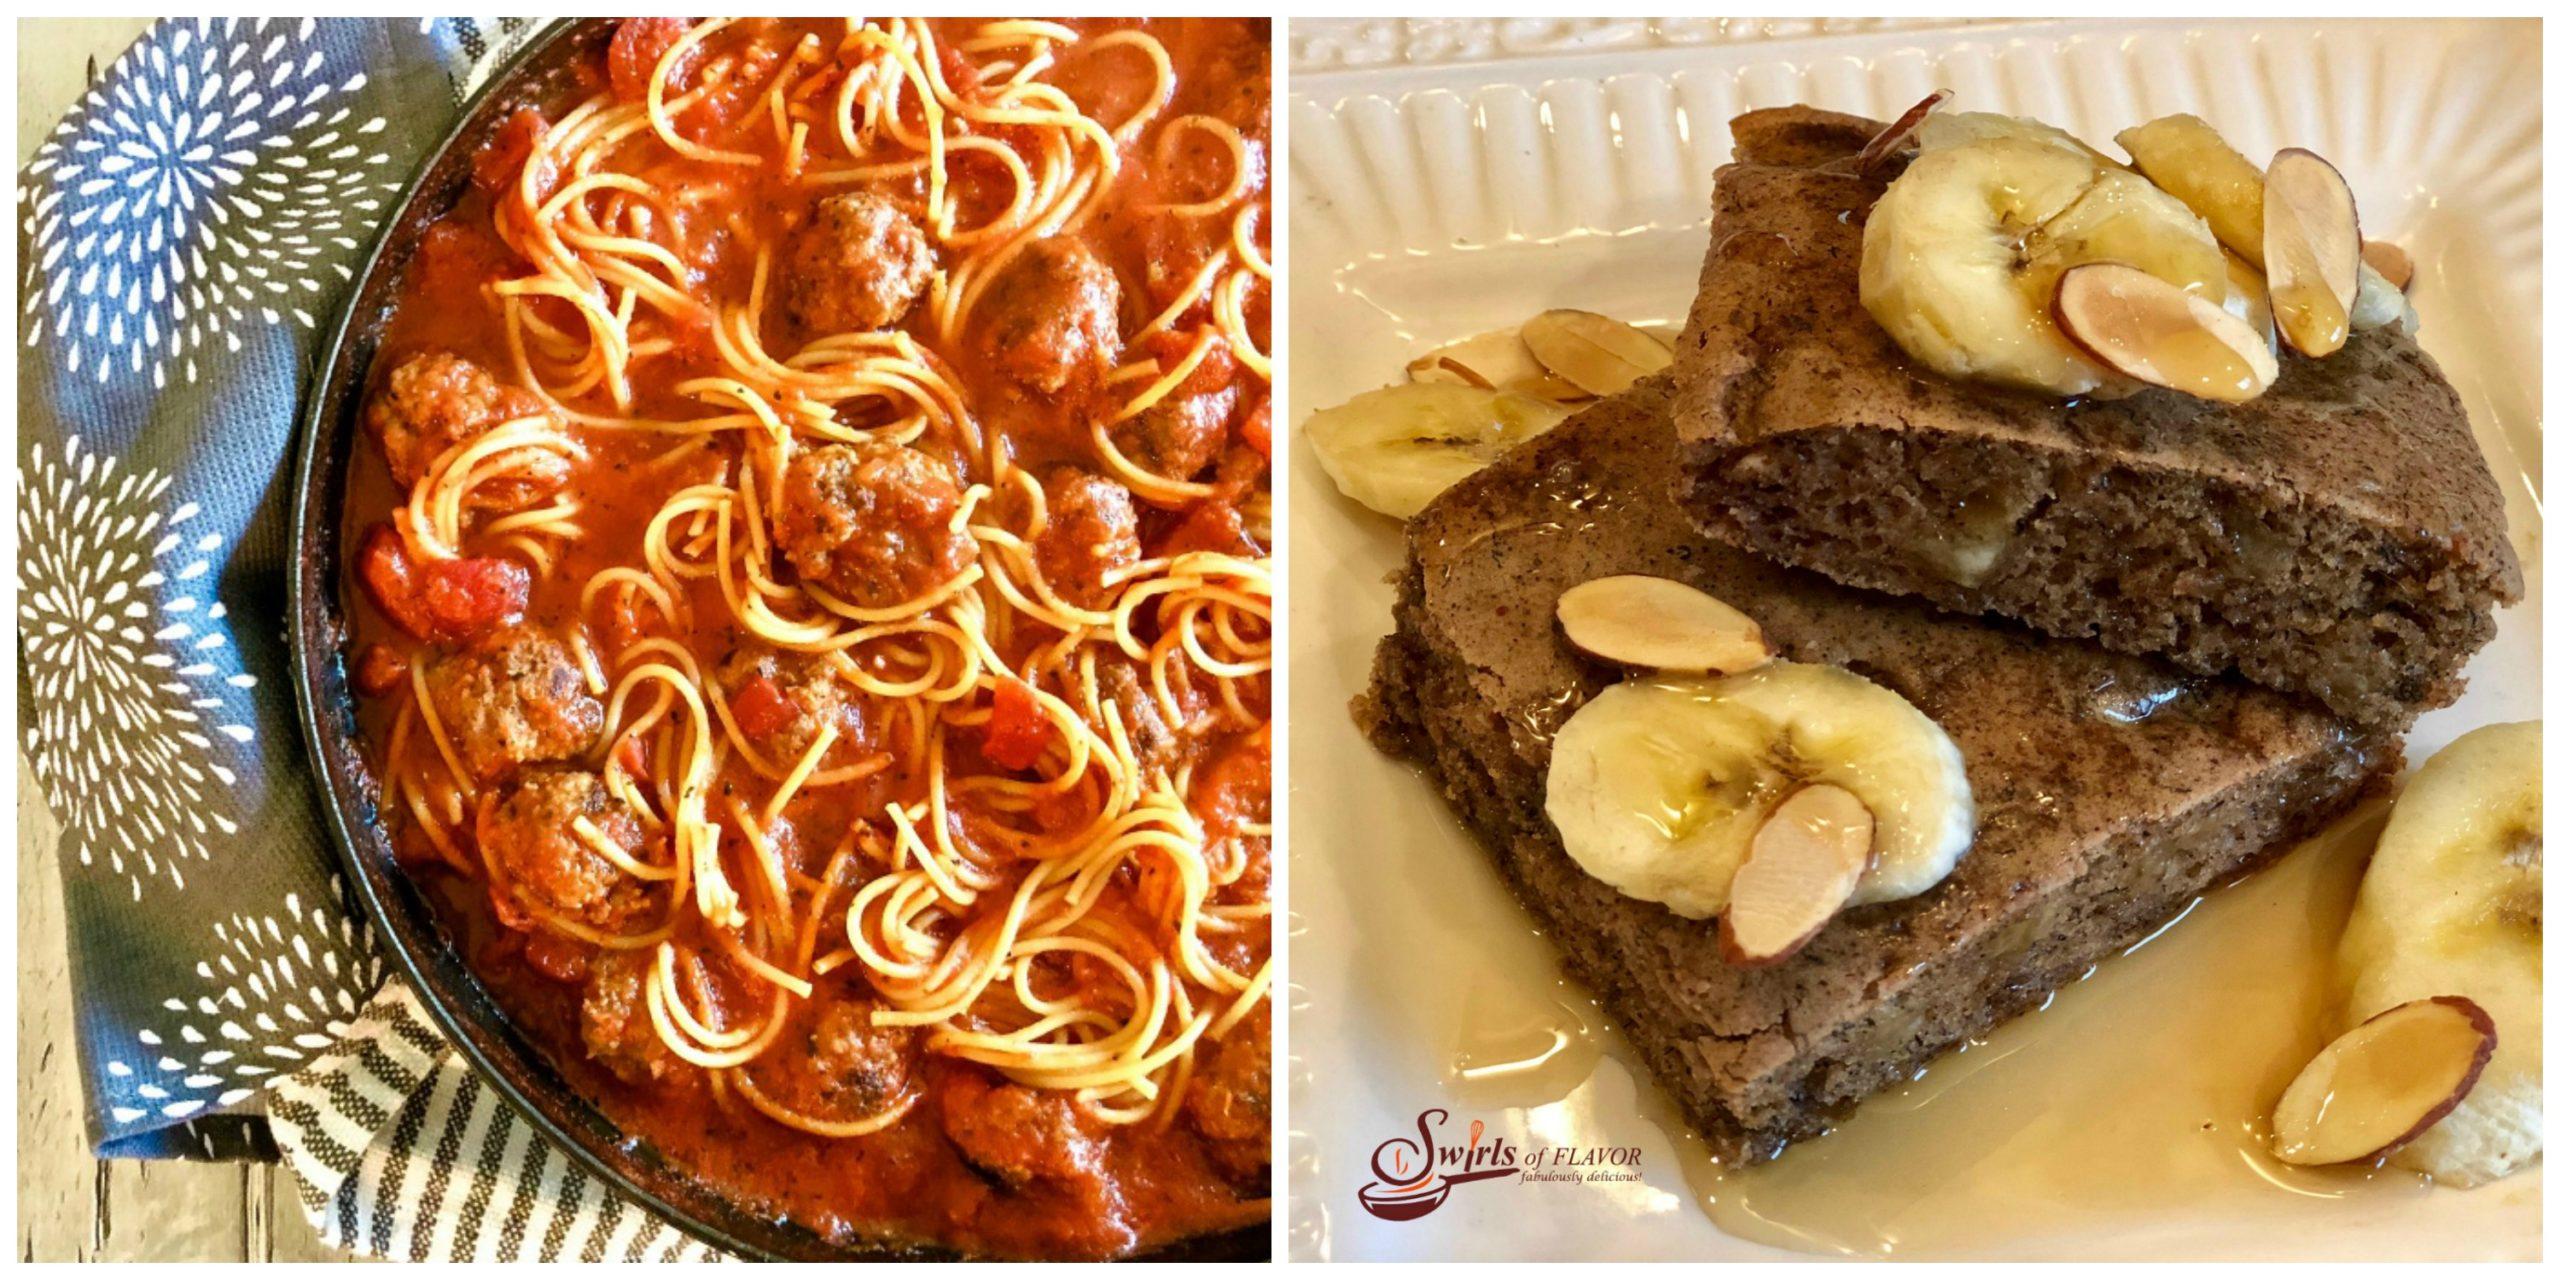 Spaghetti and Meatballs and Banana Pancakes